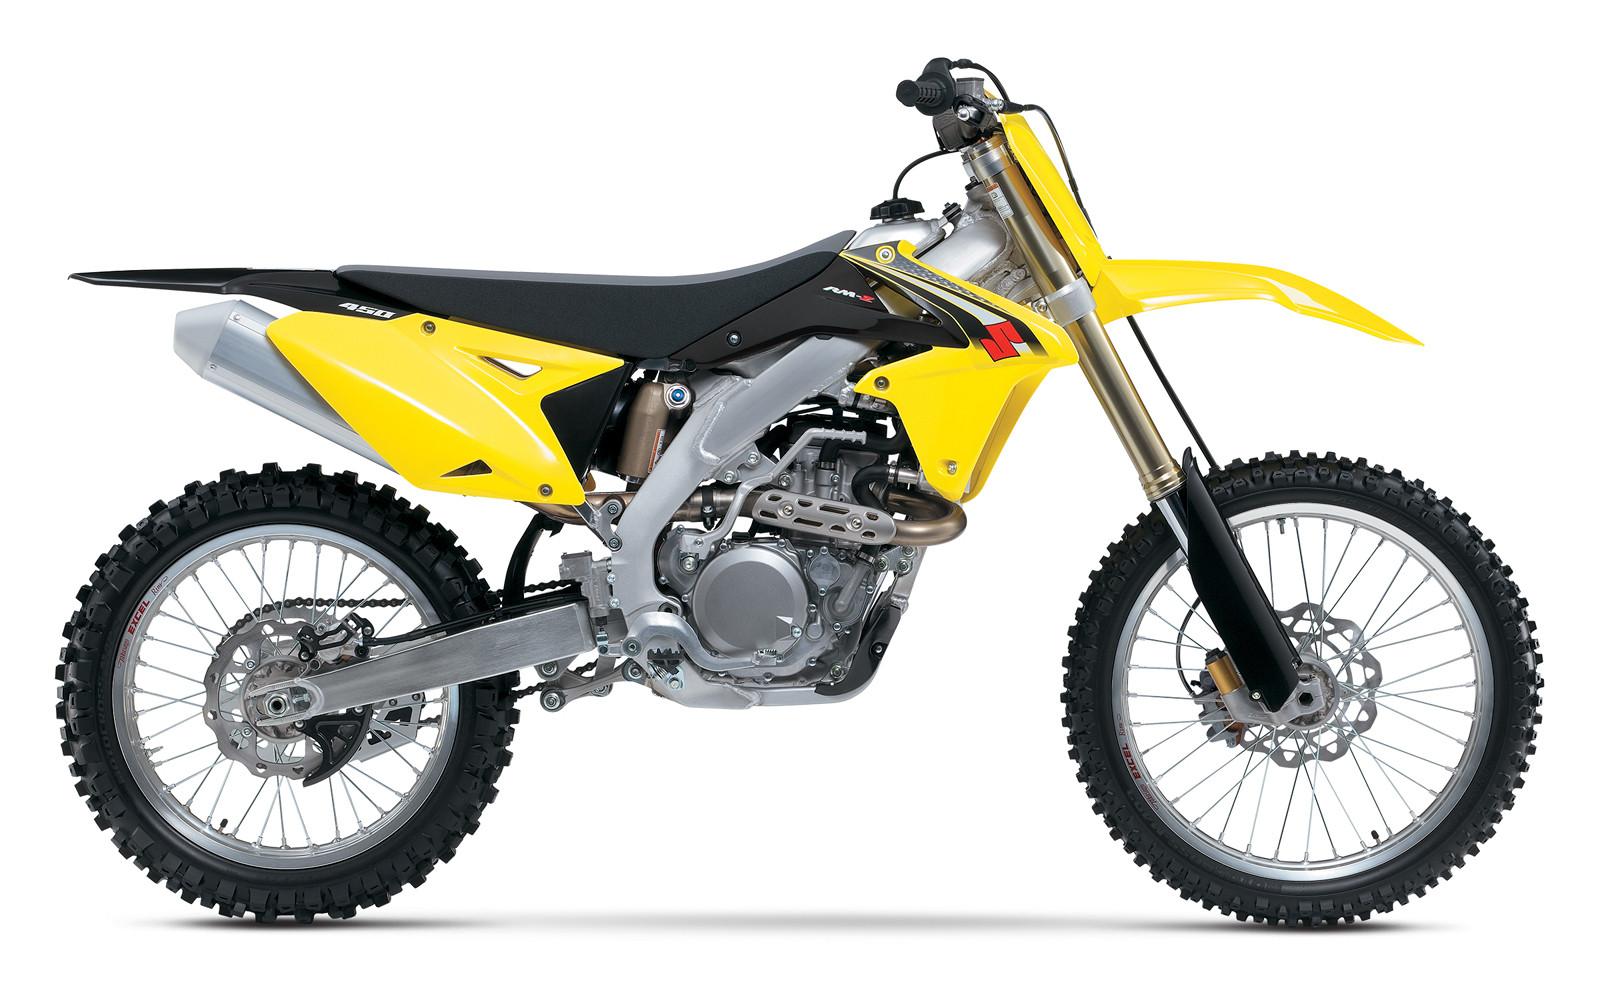 2016 Suzuki RM-Z450 - First Look: 2016 Suzuki RM-Z250 - Motocross Pictures - Vital MX